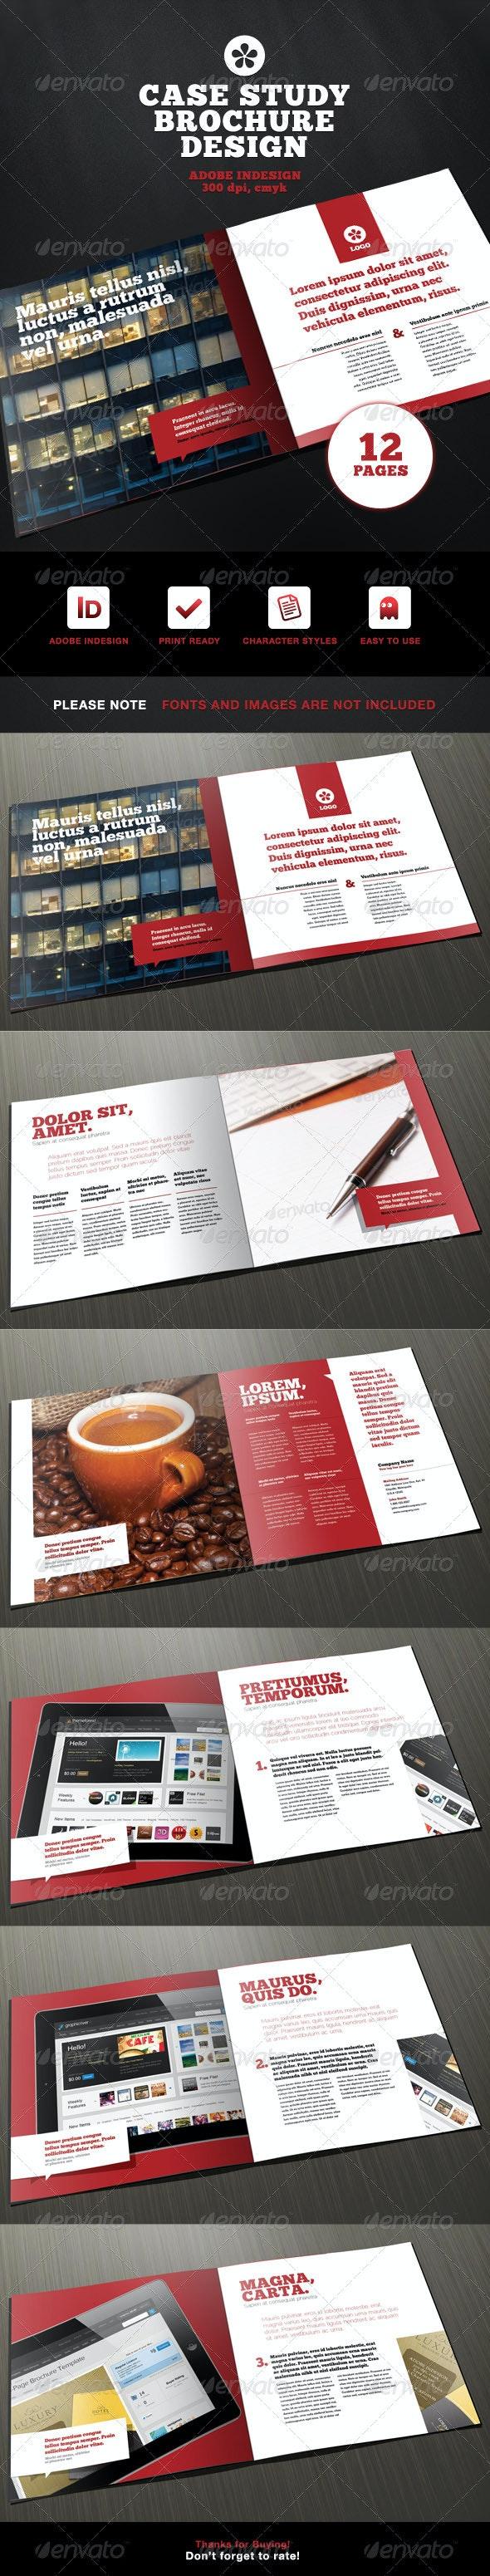 Professional Case Study Brochure Design - Corporate Brochures